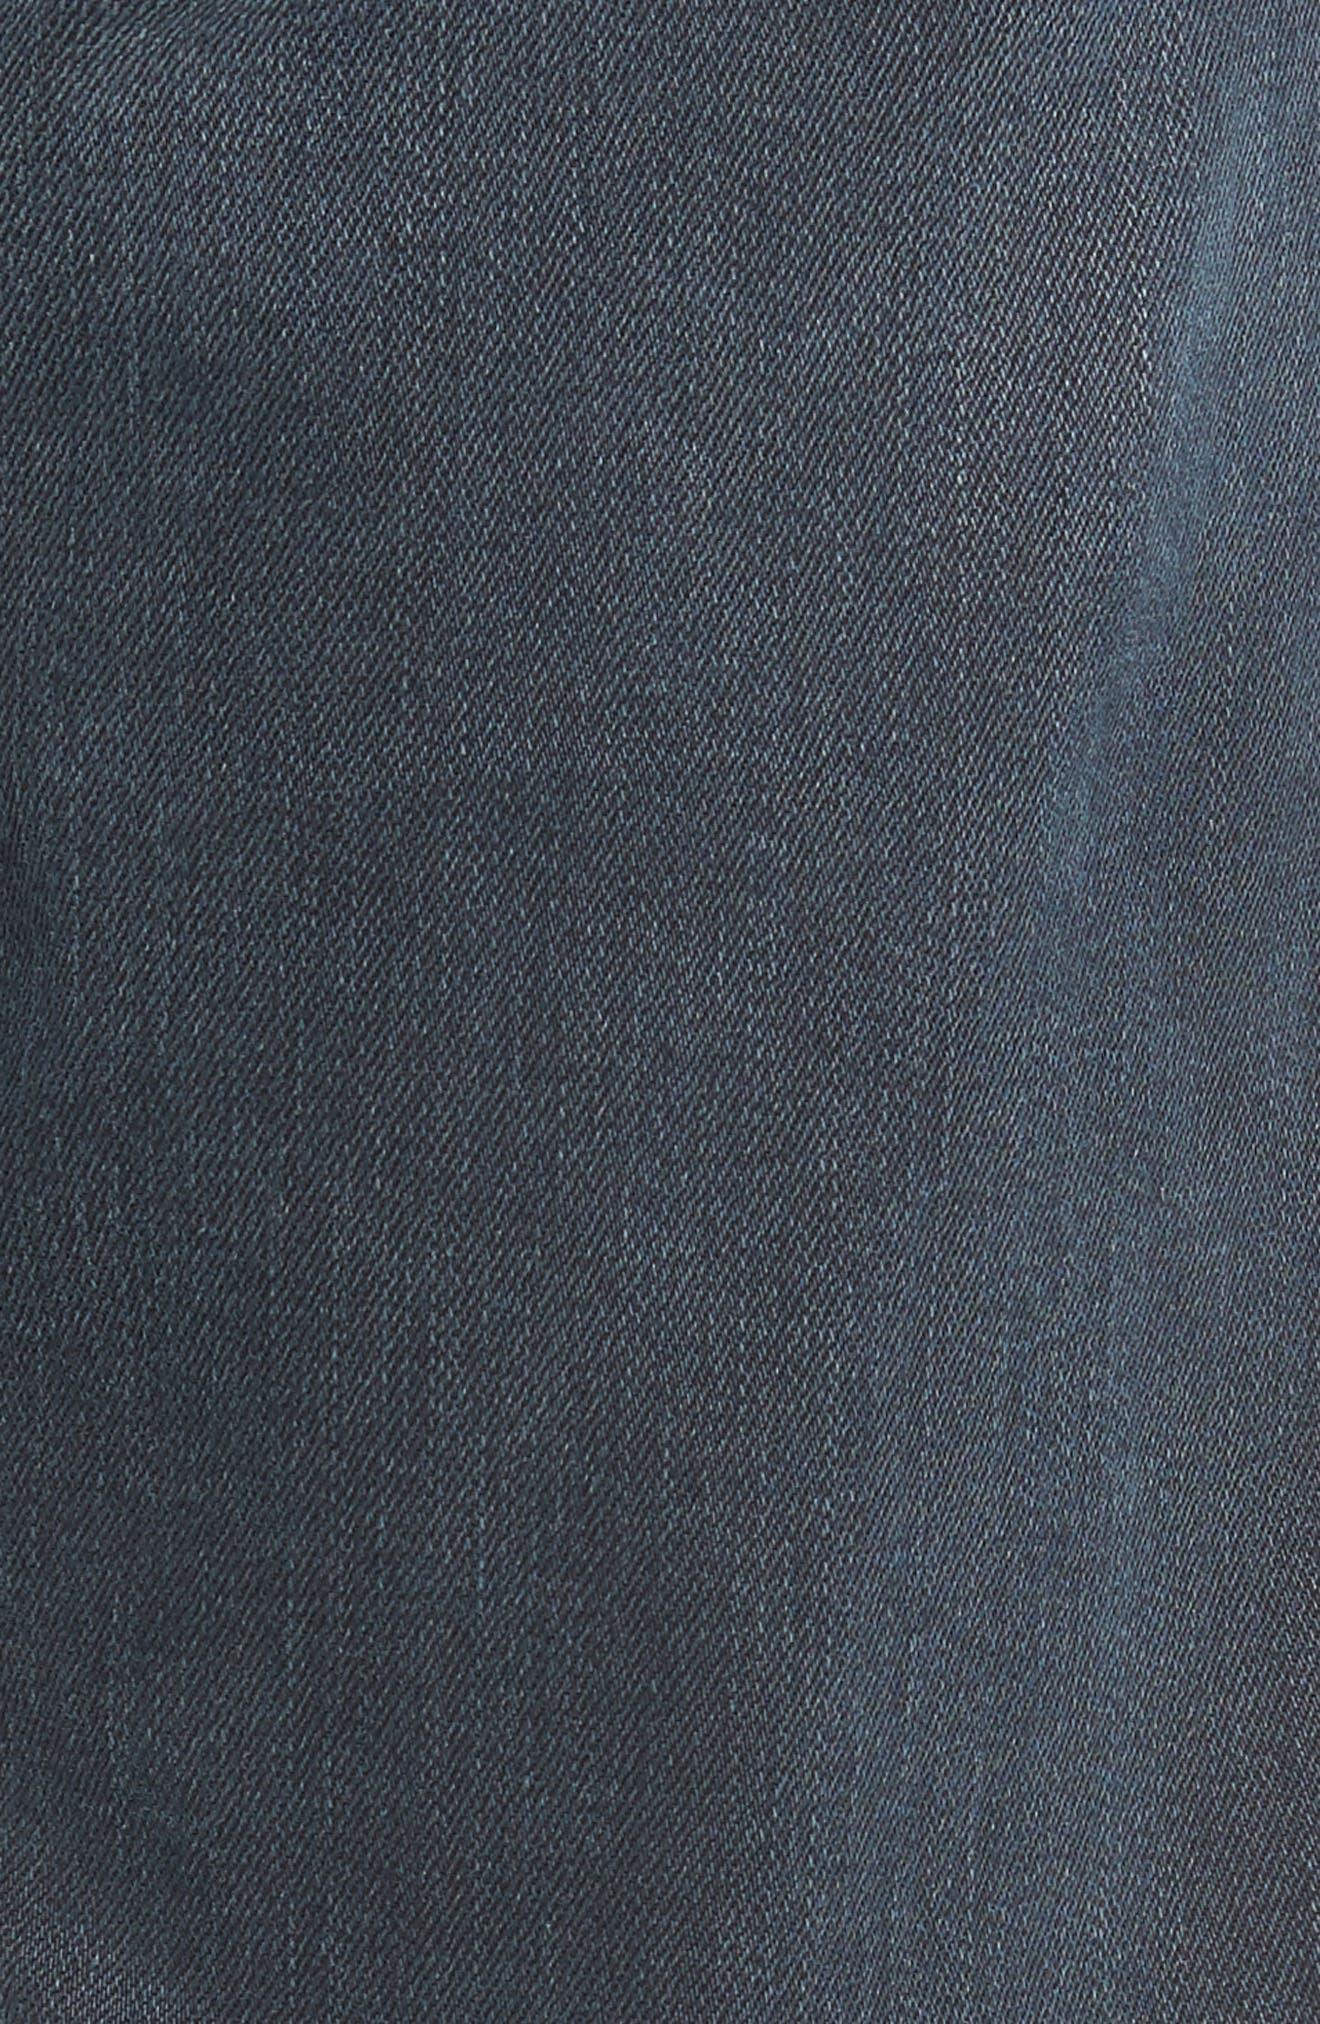 Fit 2 Slim Fit Jean,                             Alternate thumbnail 5, color,                             MINNA